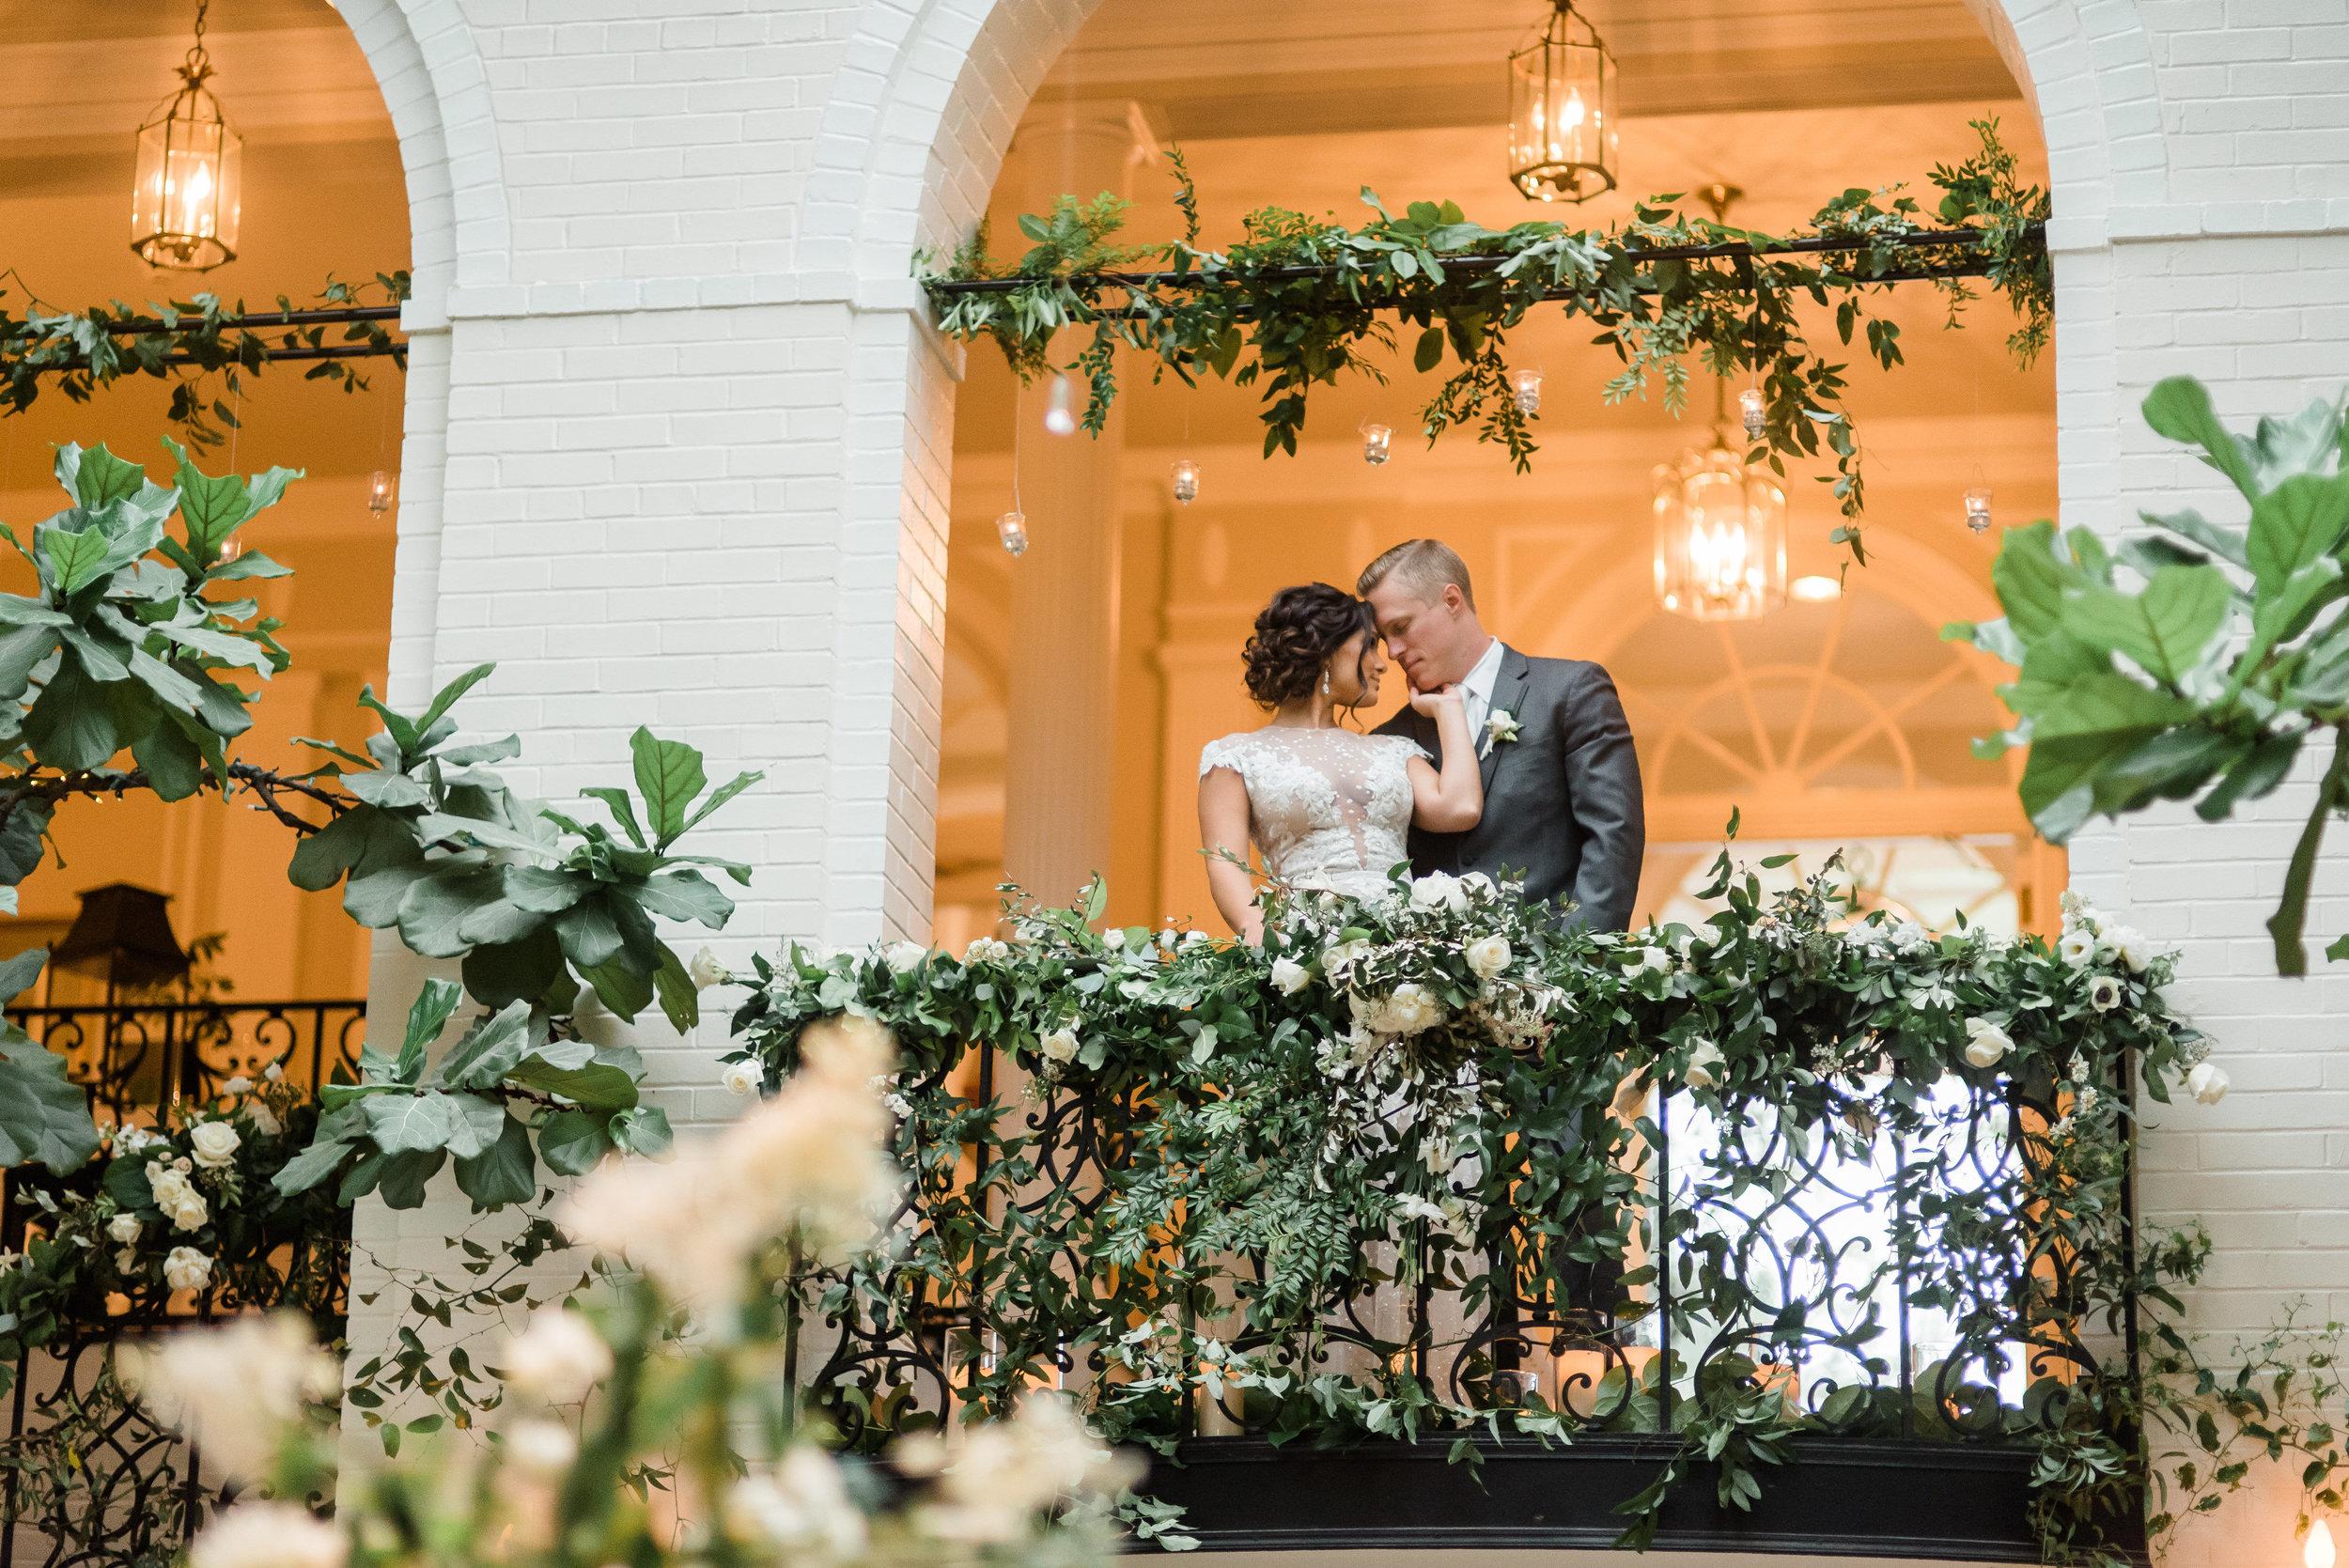 pittsburgh-wedding-photographer-classic-greenery-foxchapelgolfclub0028.jpg